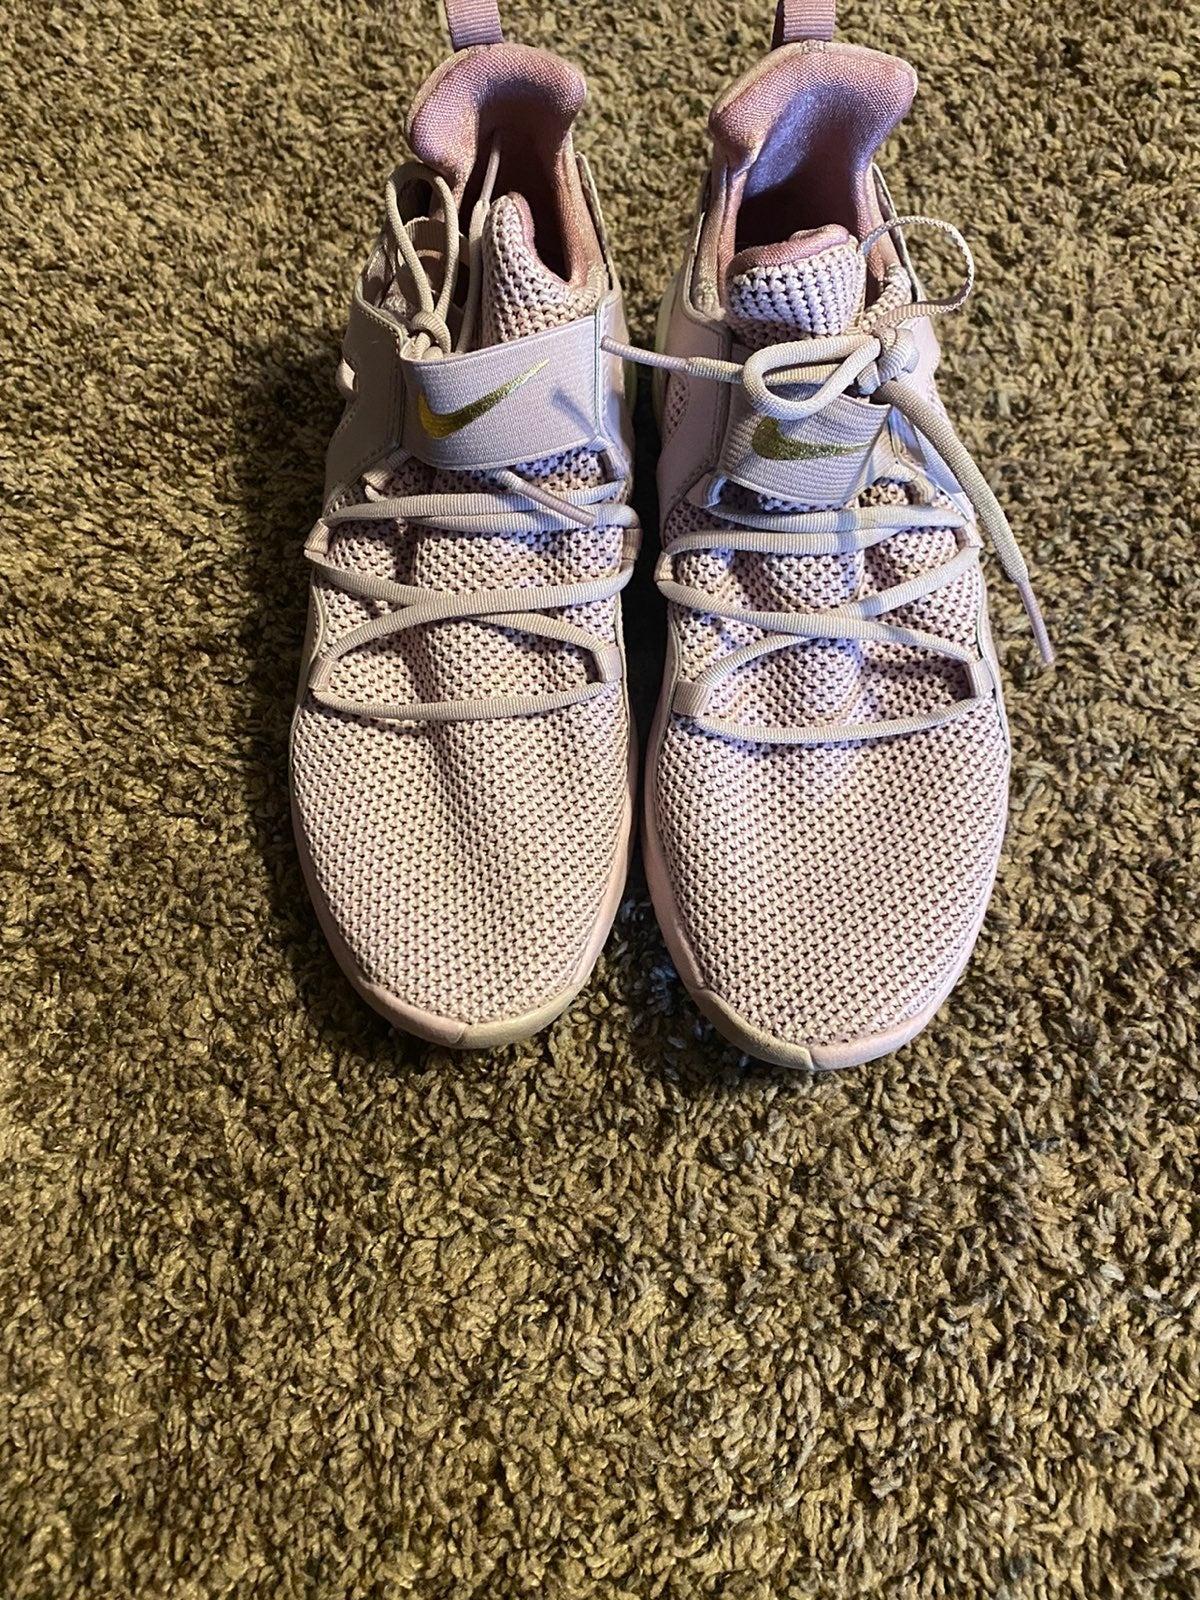 Like new Nike sneakers